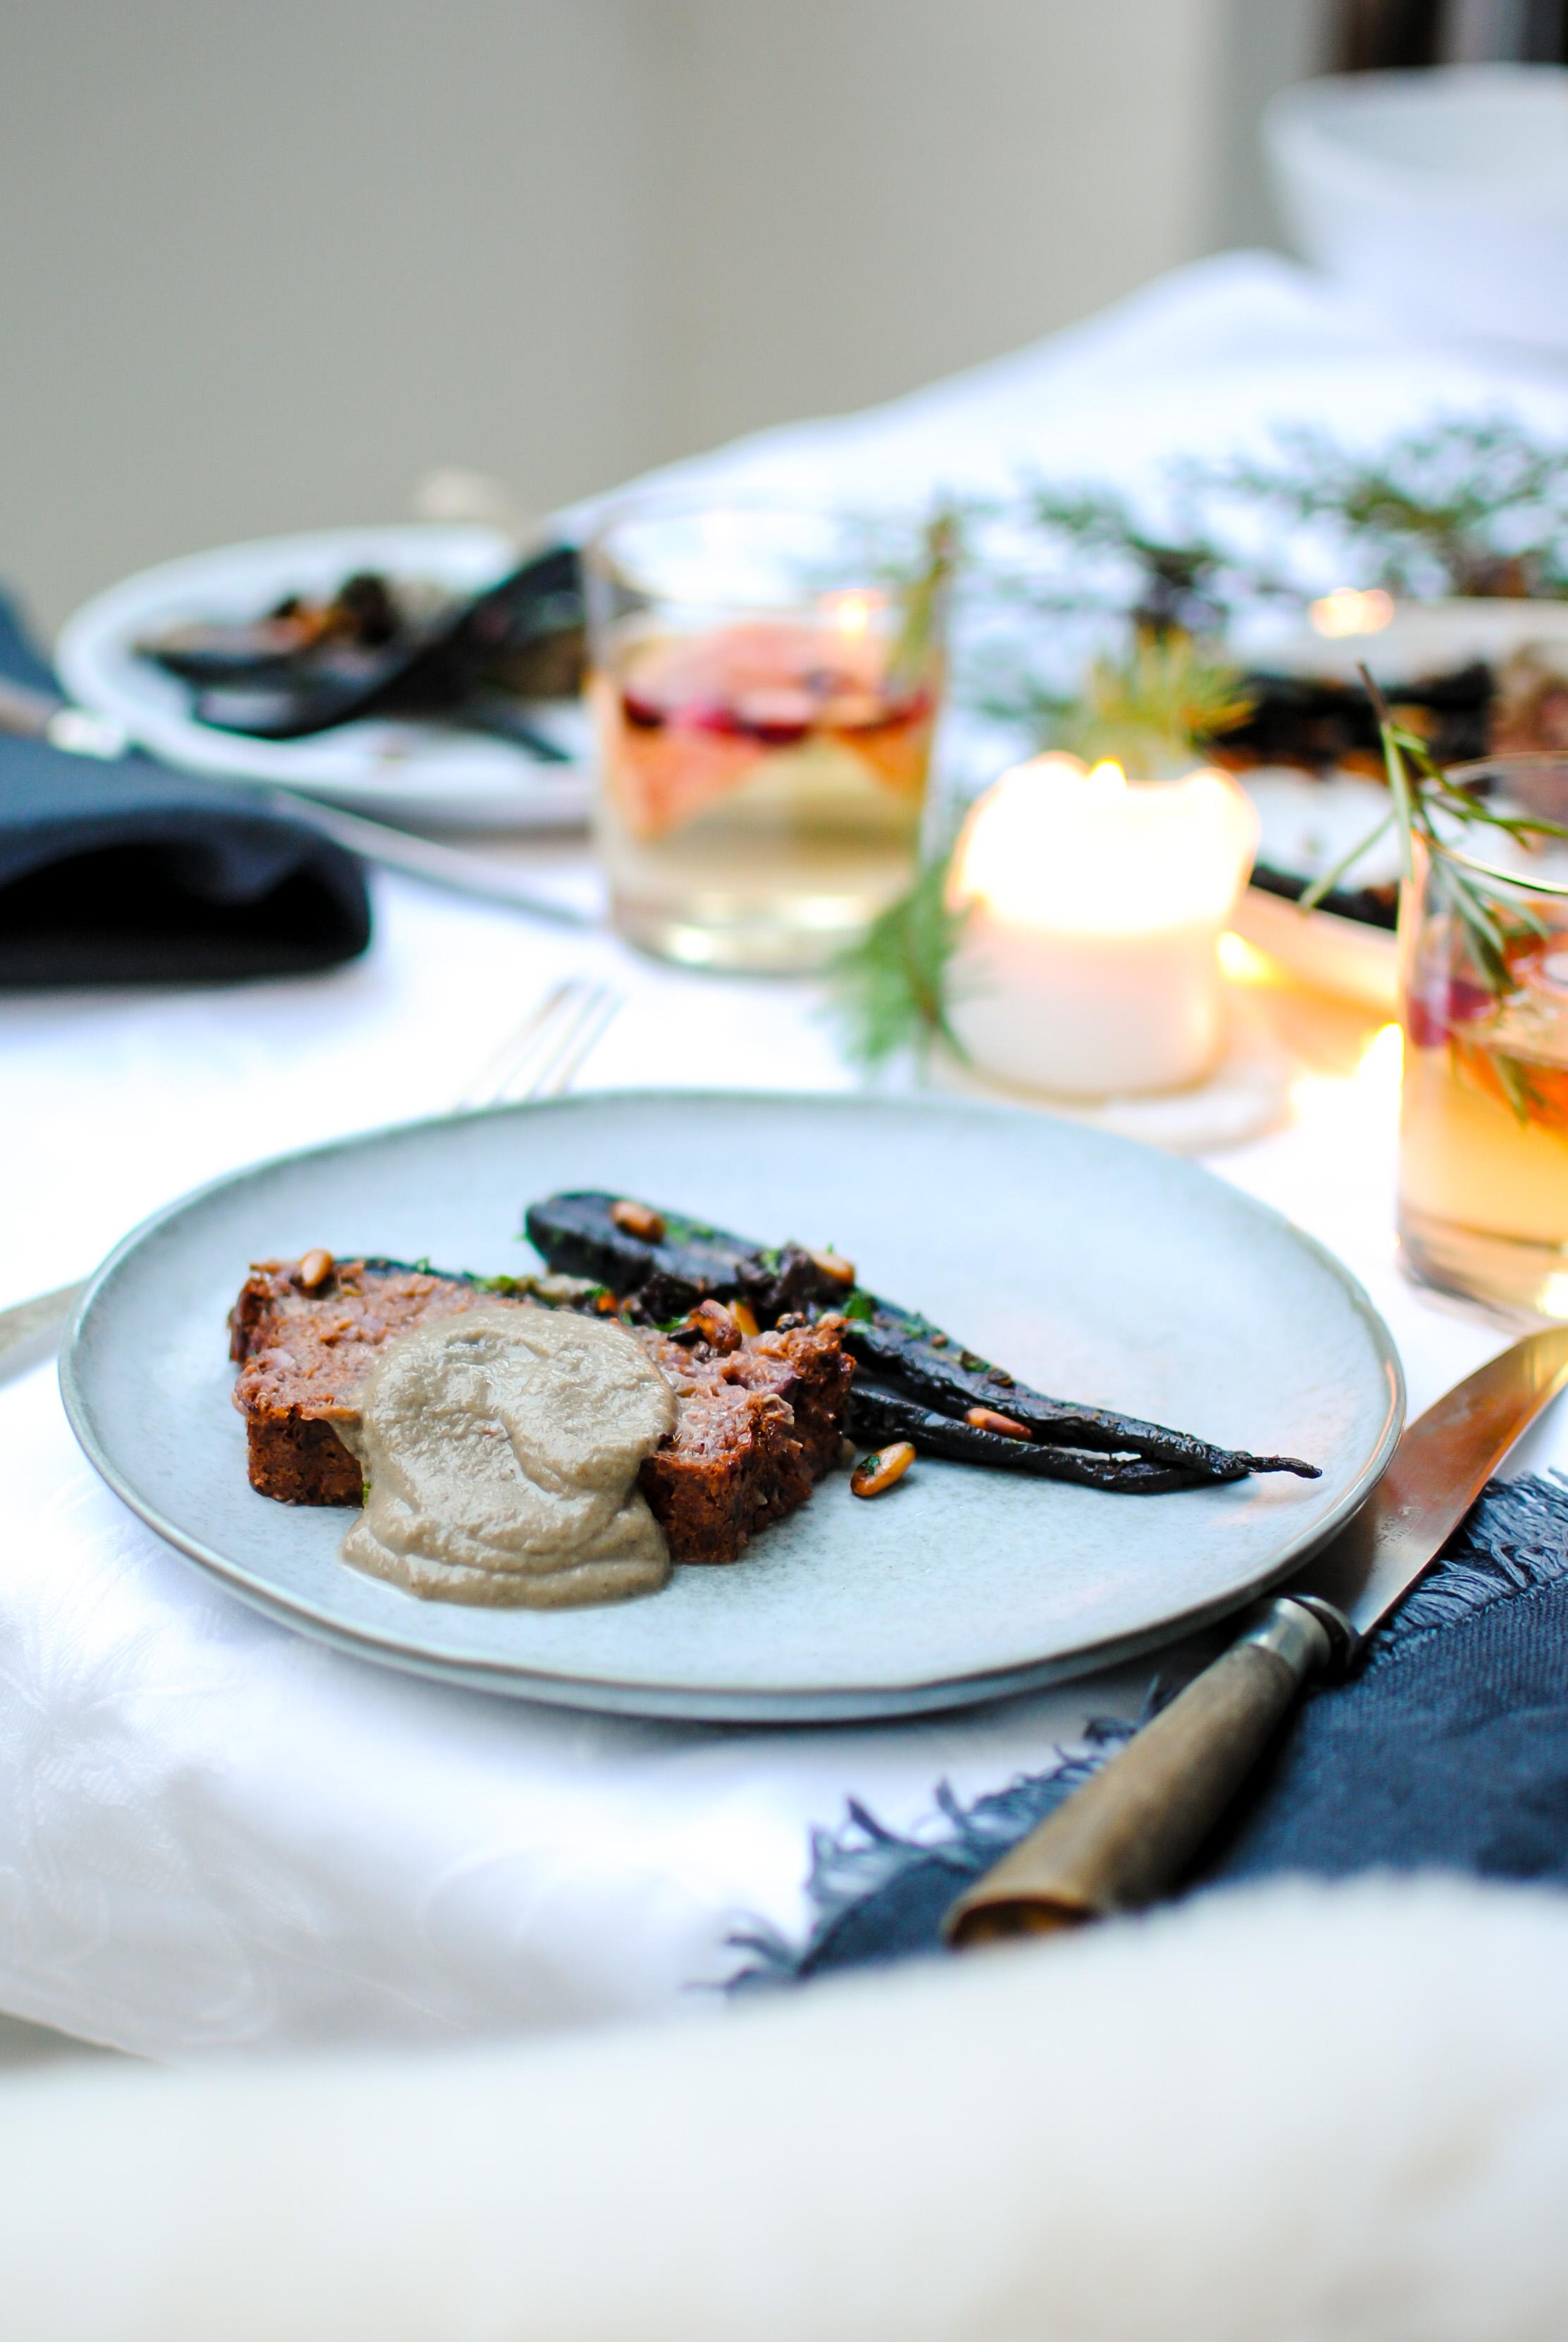 vegan meatloaf | please consider | joana limao